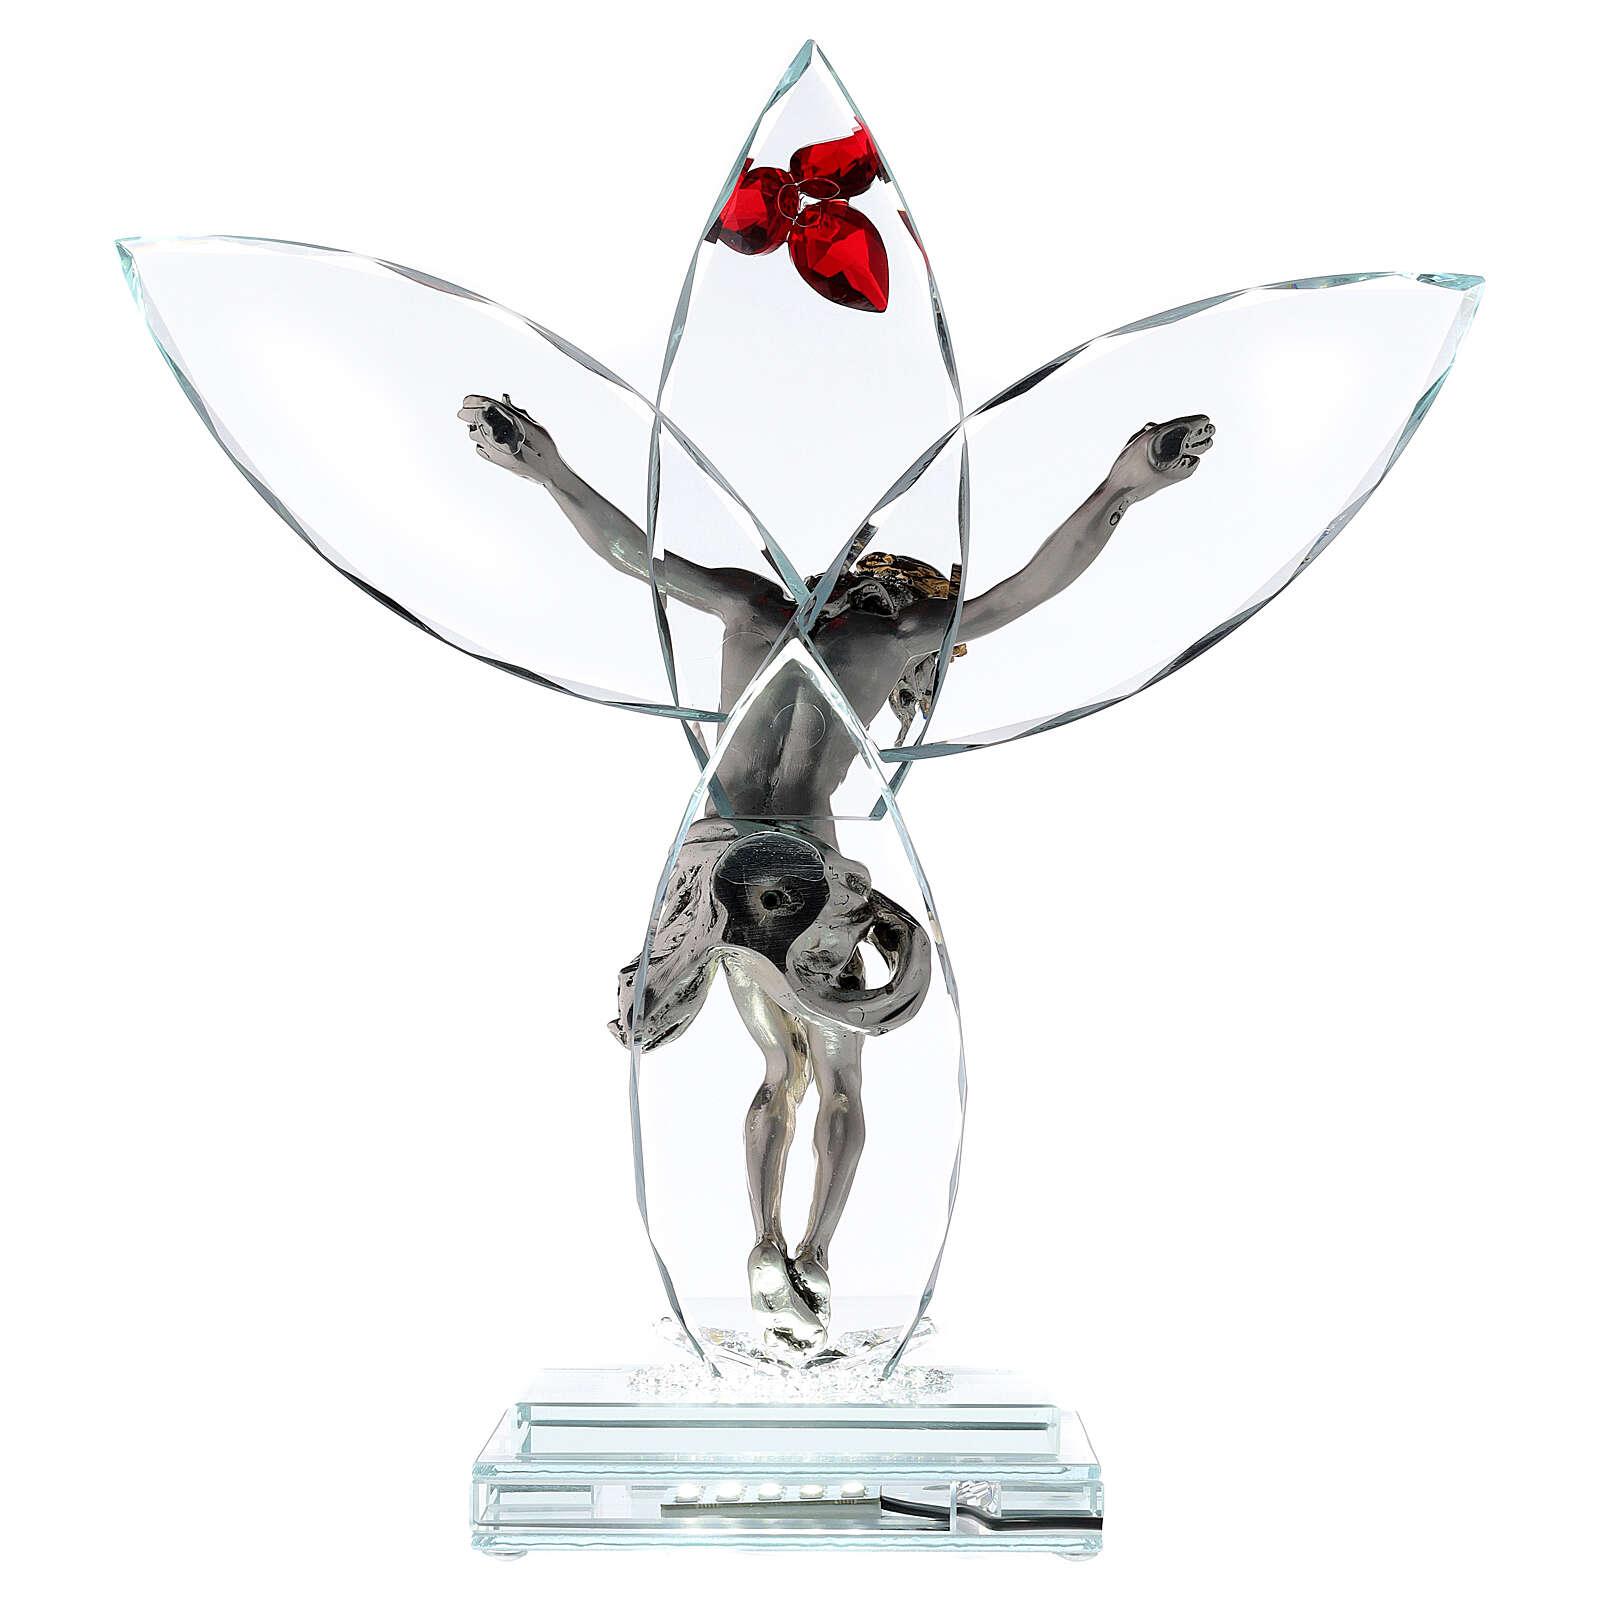 Crucifijo vidrio flor roja lámpara 4